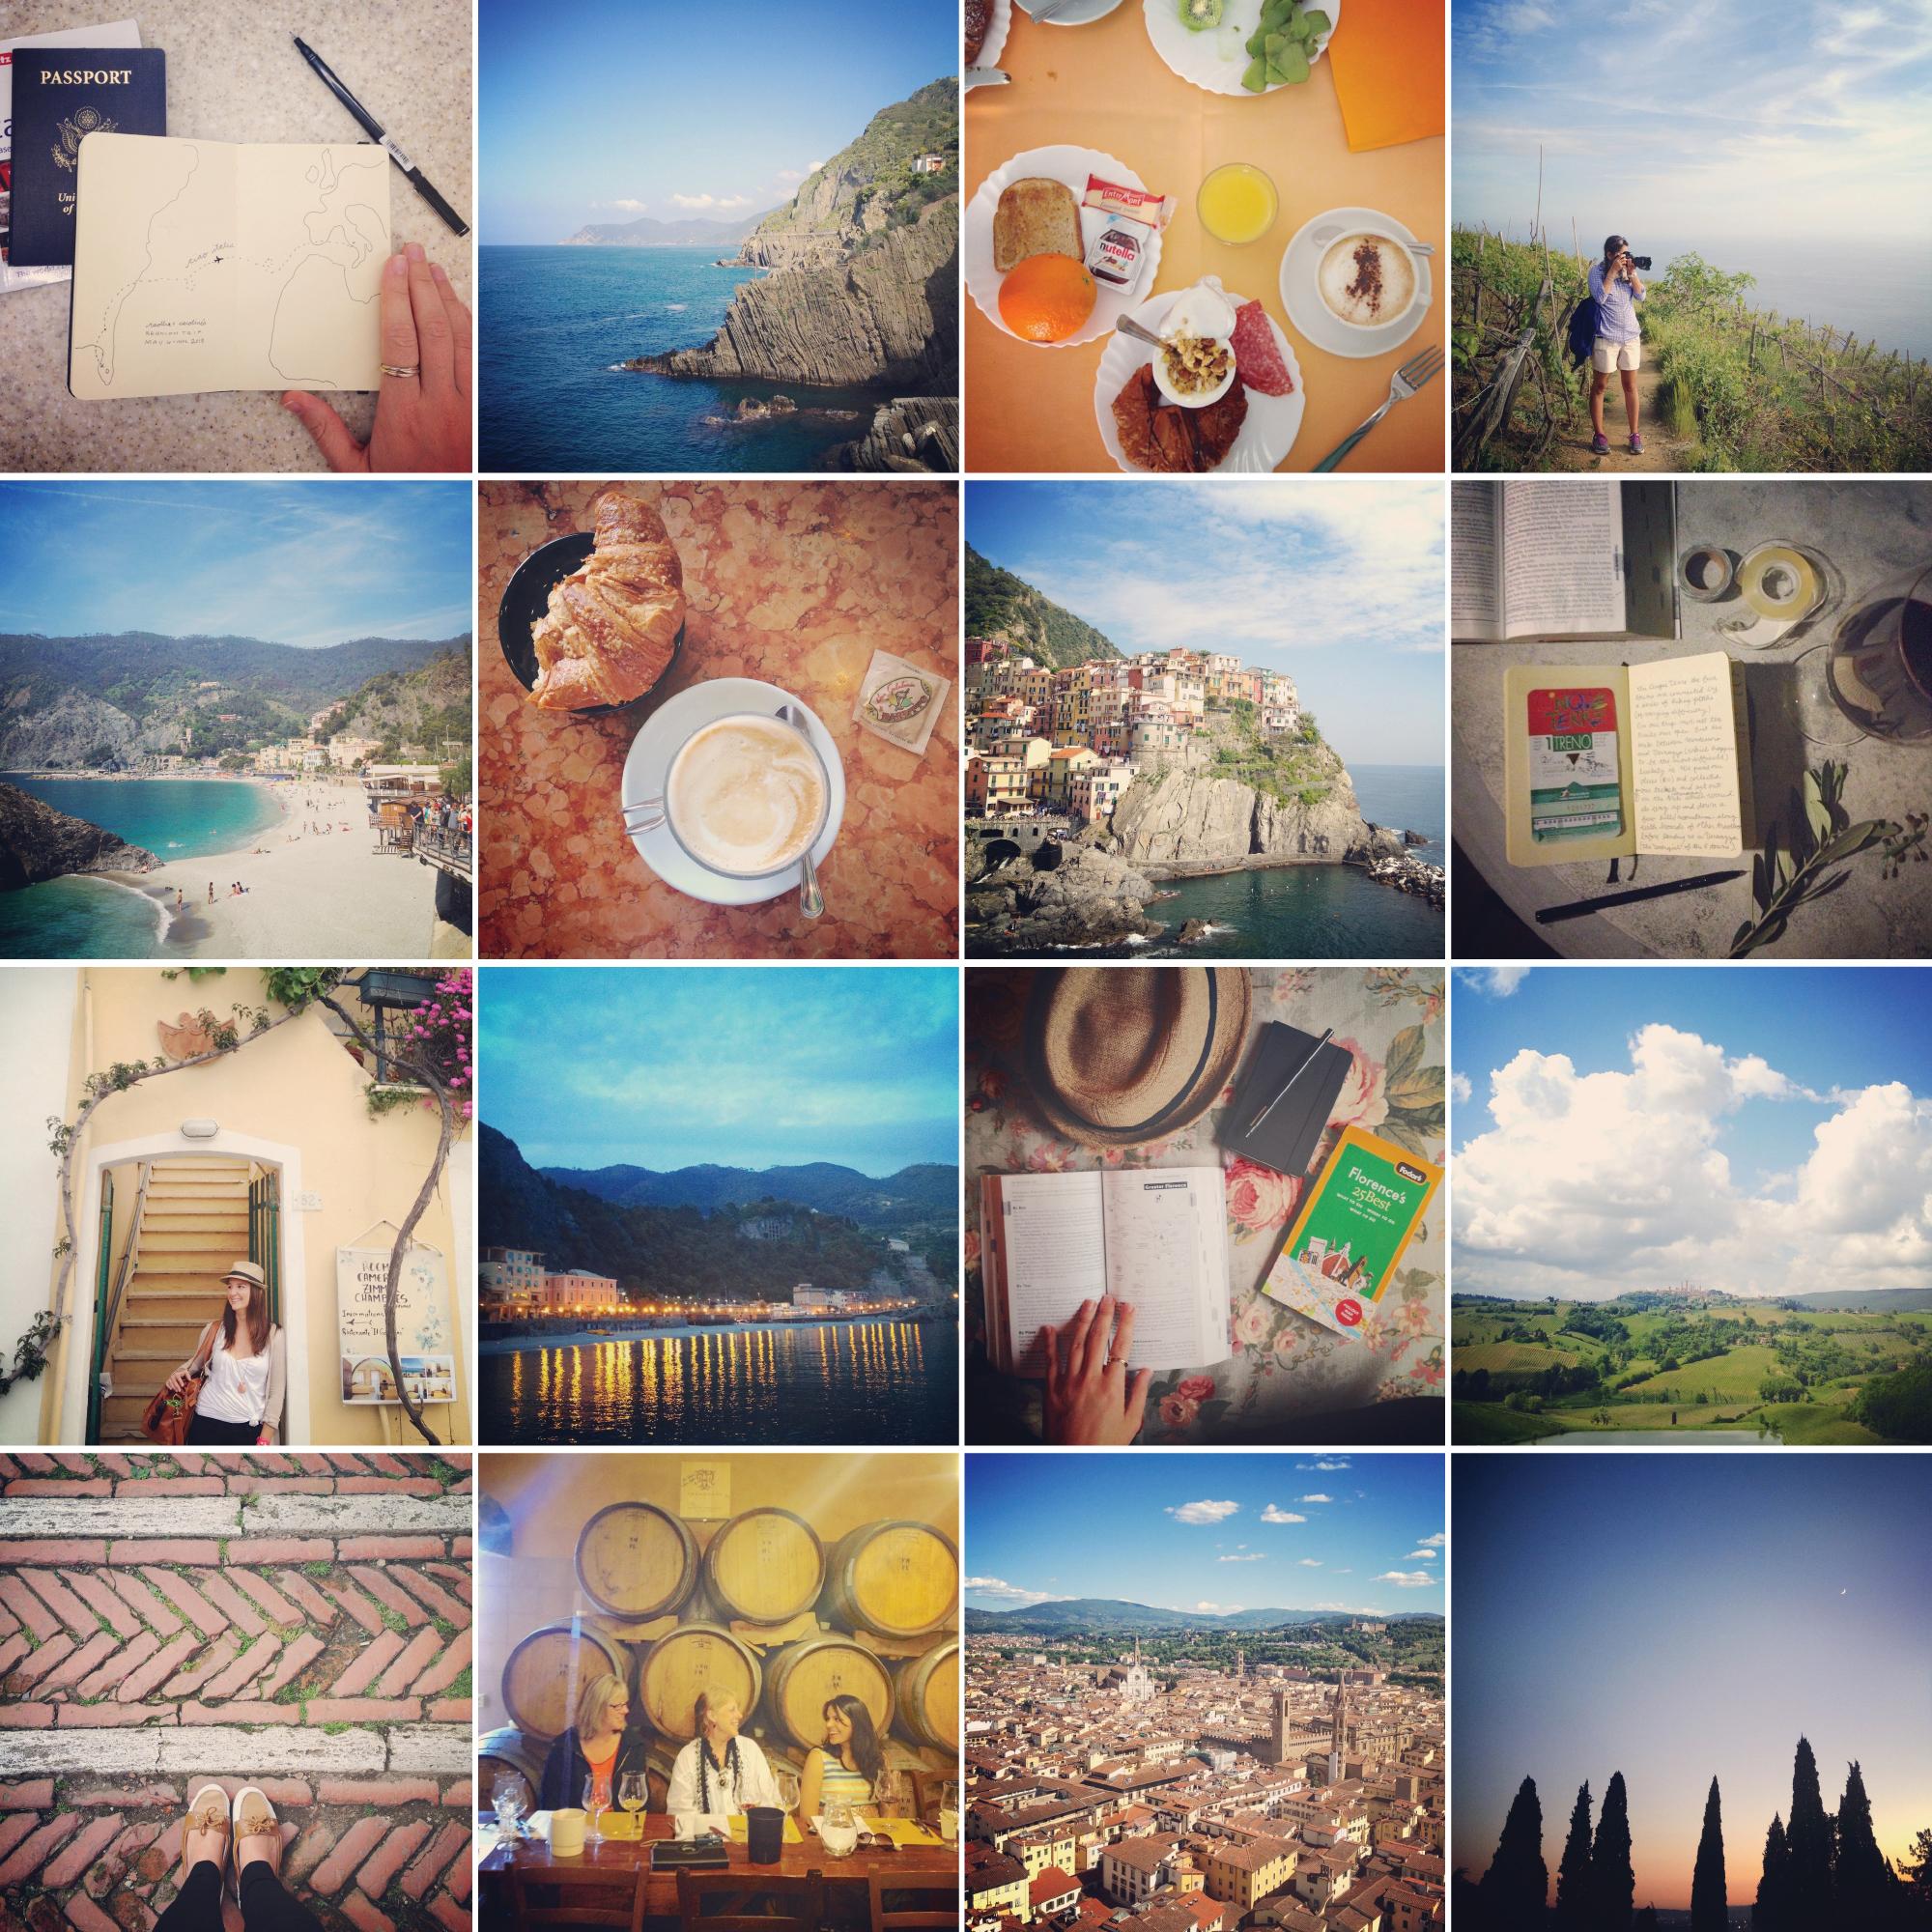 Just a little peek into my Italian Adventures via my favorite Instagram images.